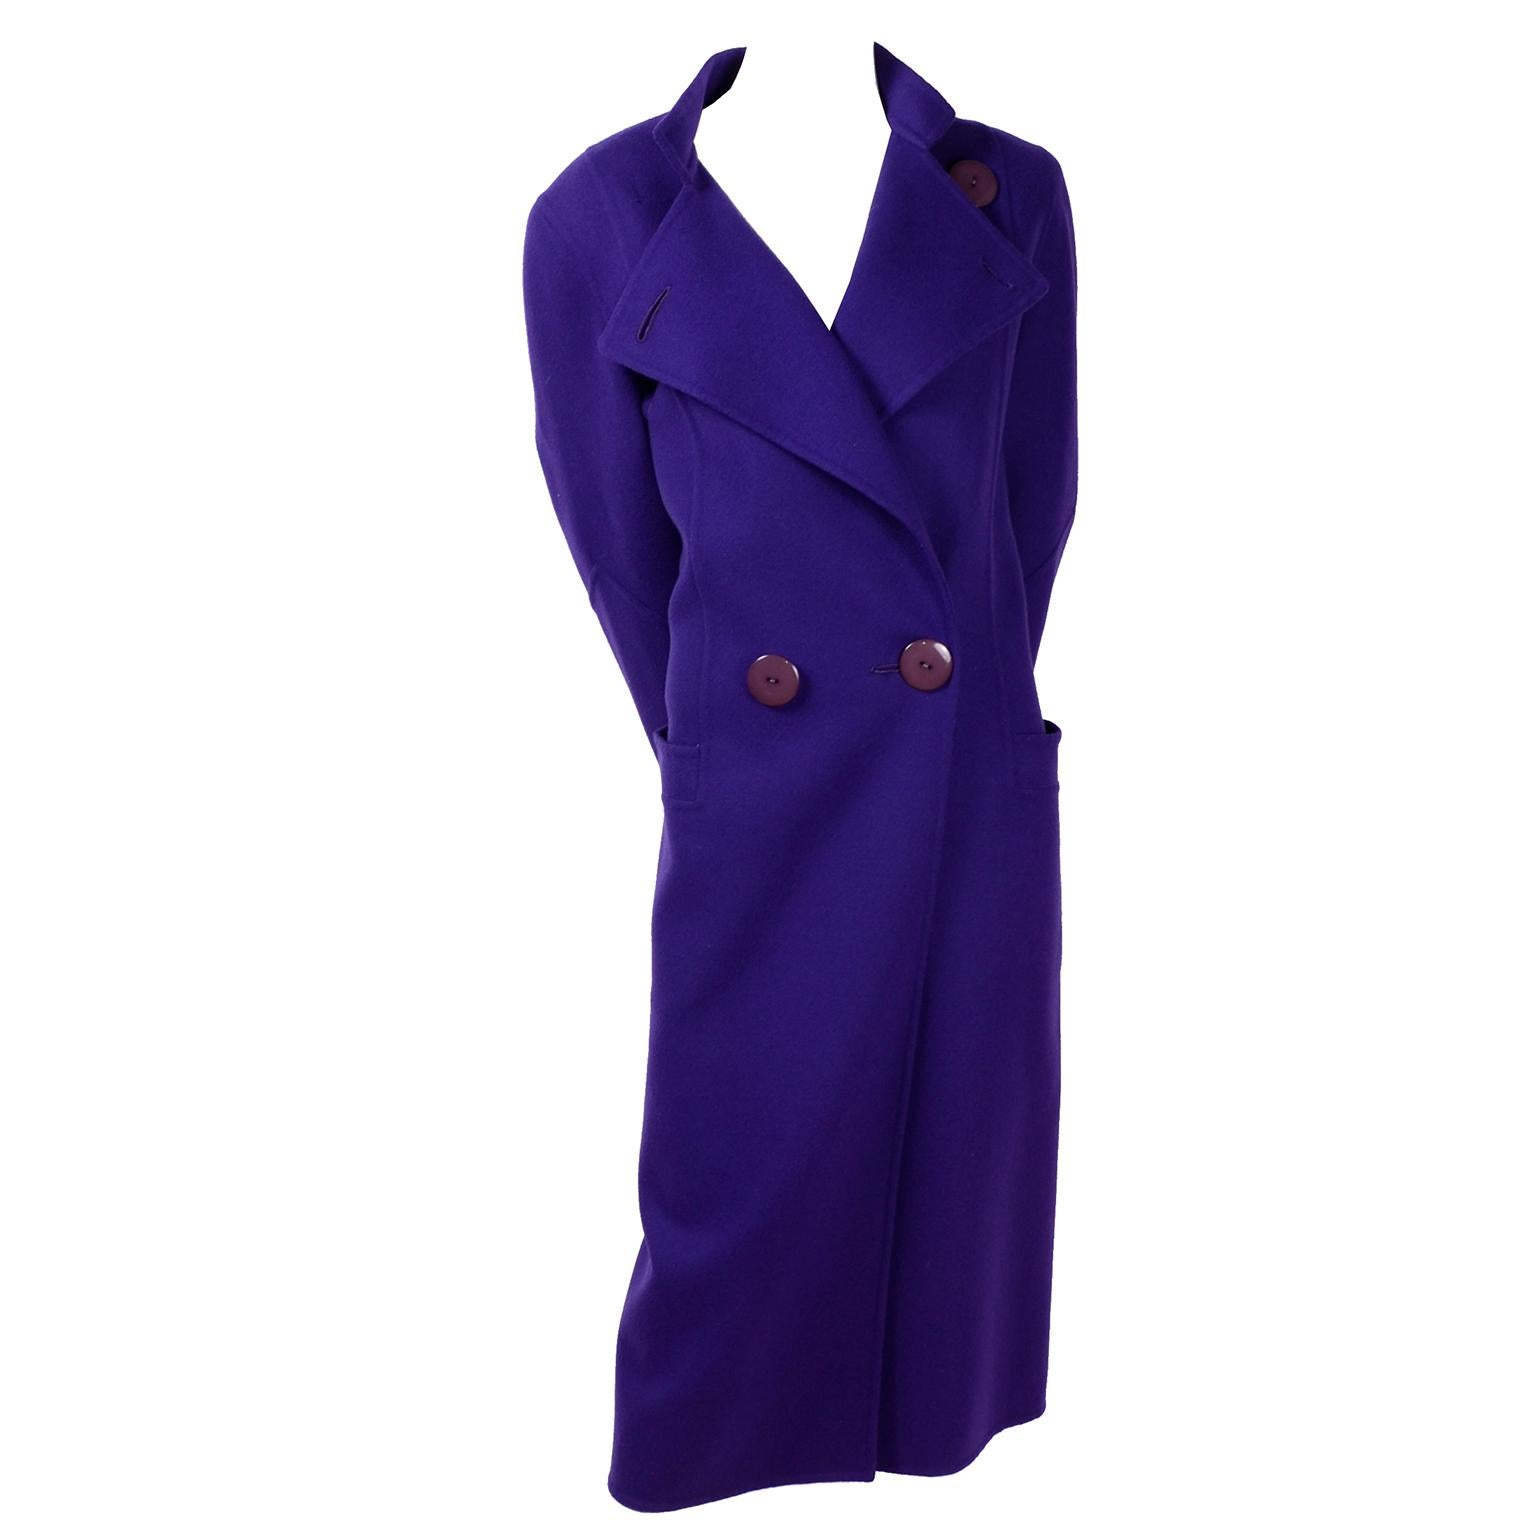 Salvatore Ferragamo Deep Purple Wool Vintage Coat